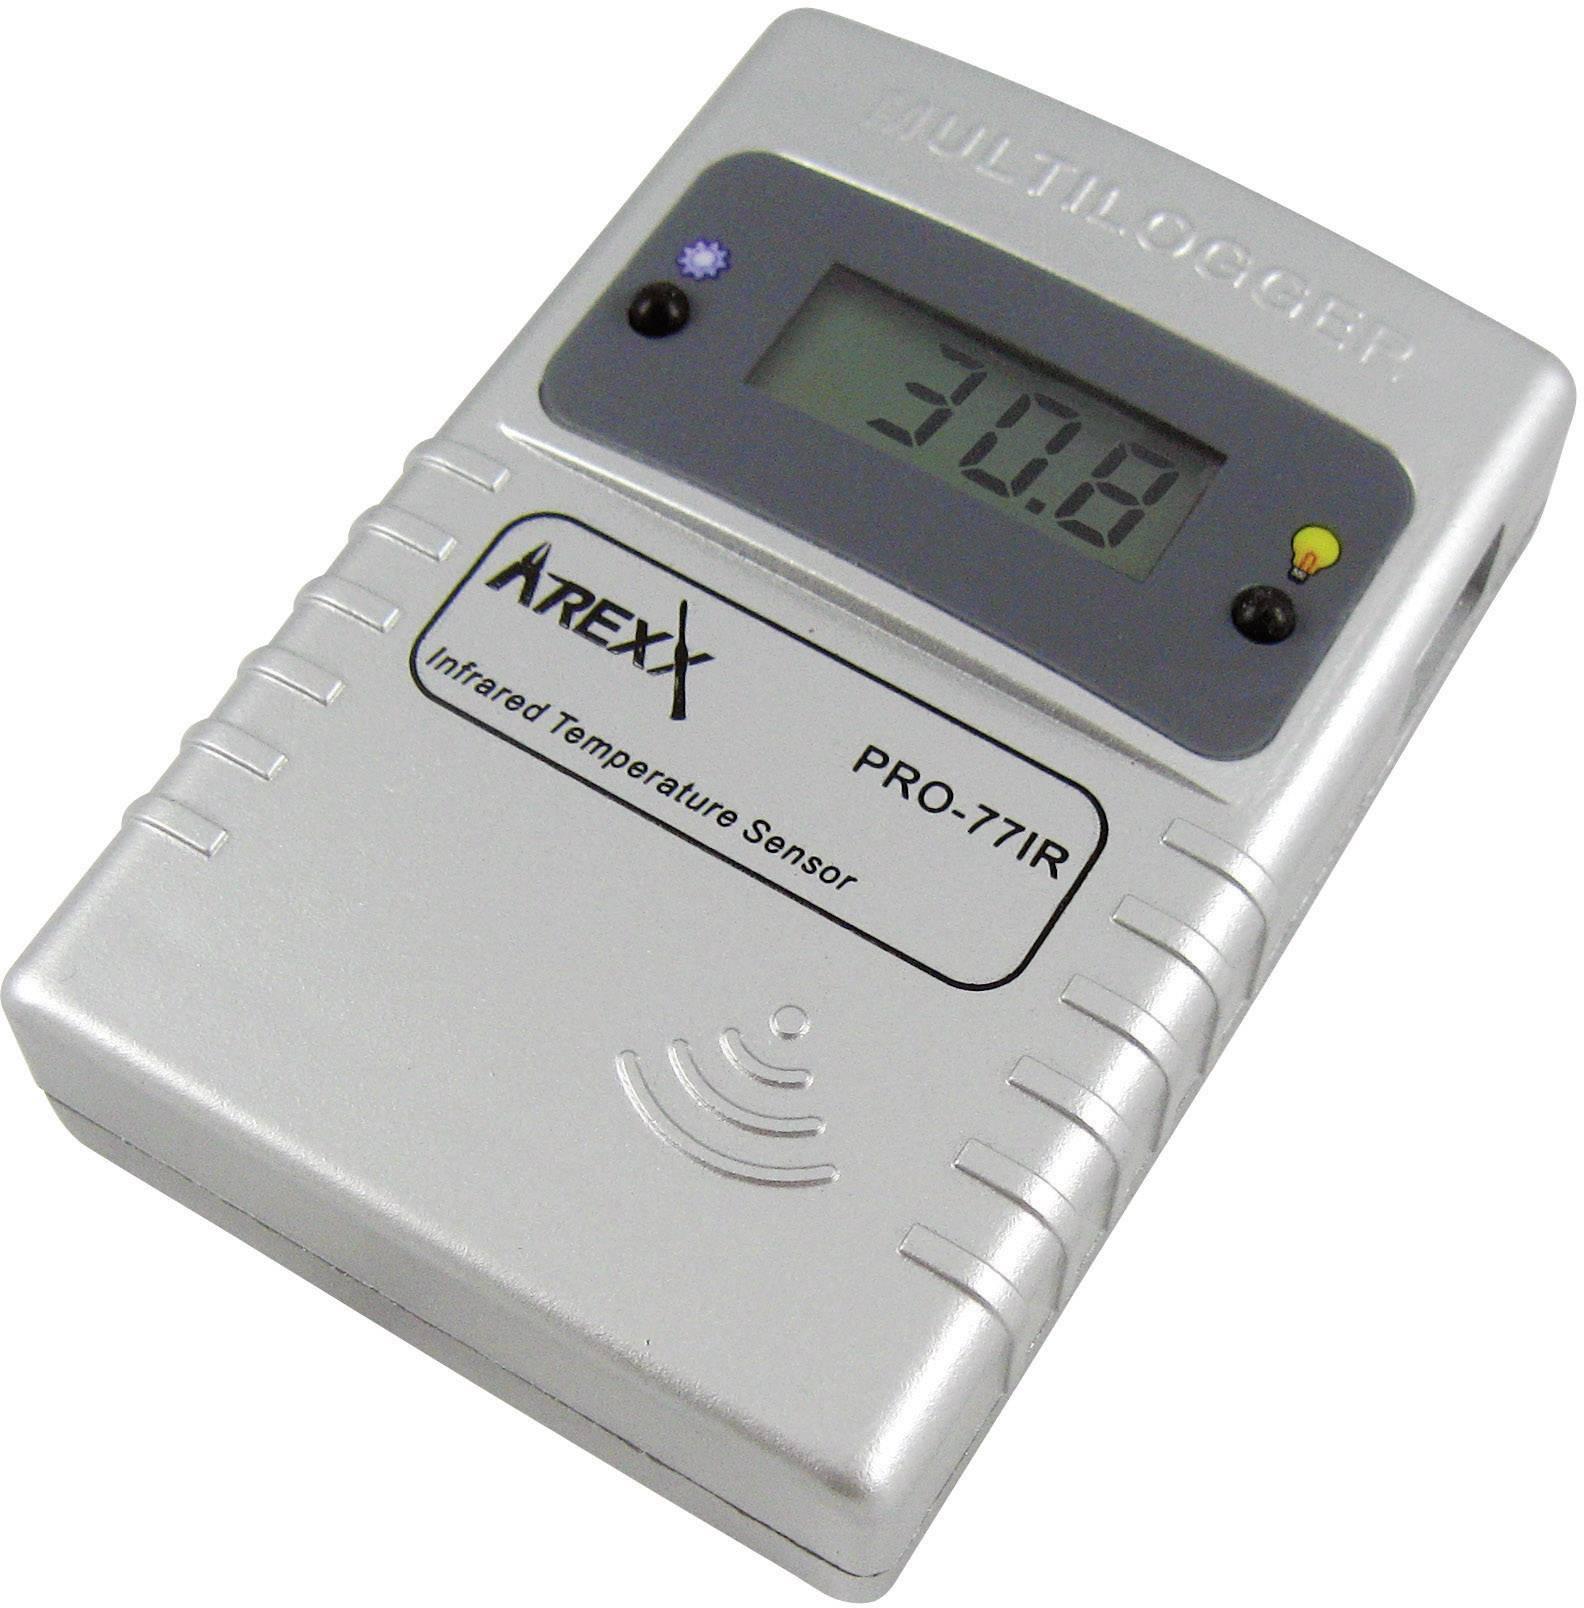 Teplotný datalogger Arexx PRO-77ir, -40 až +380 °C